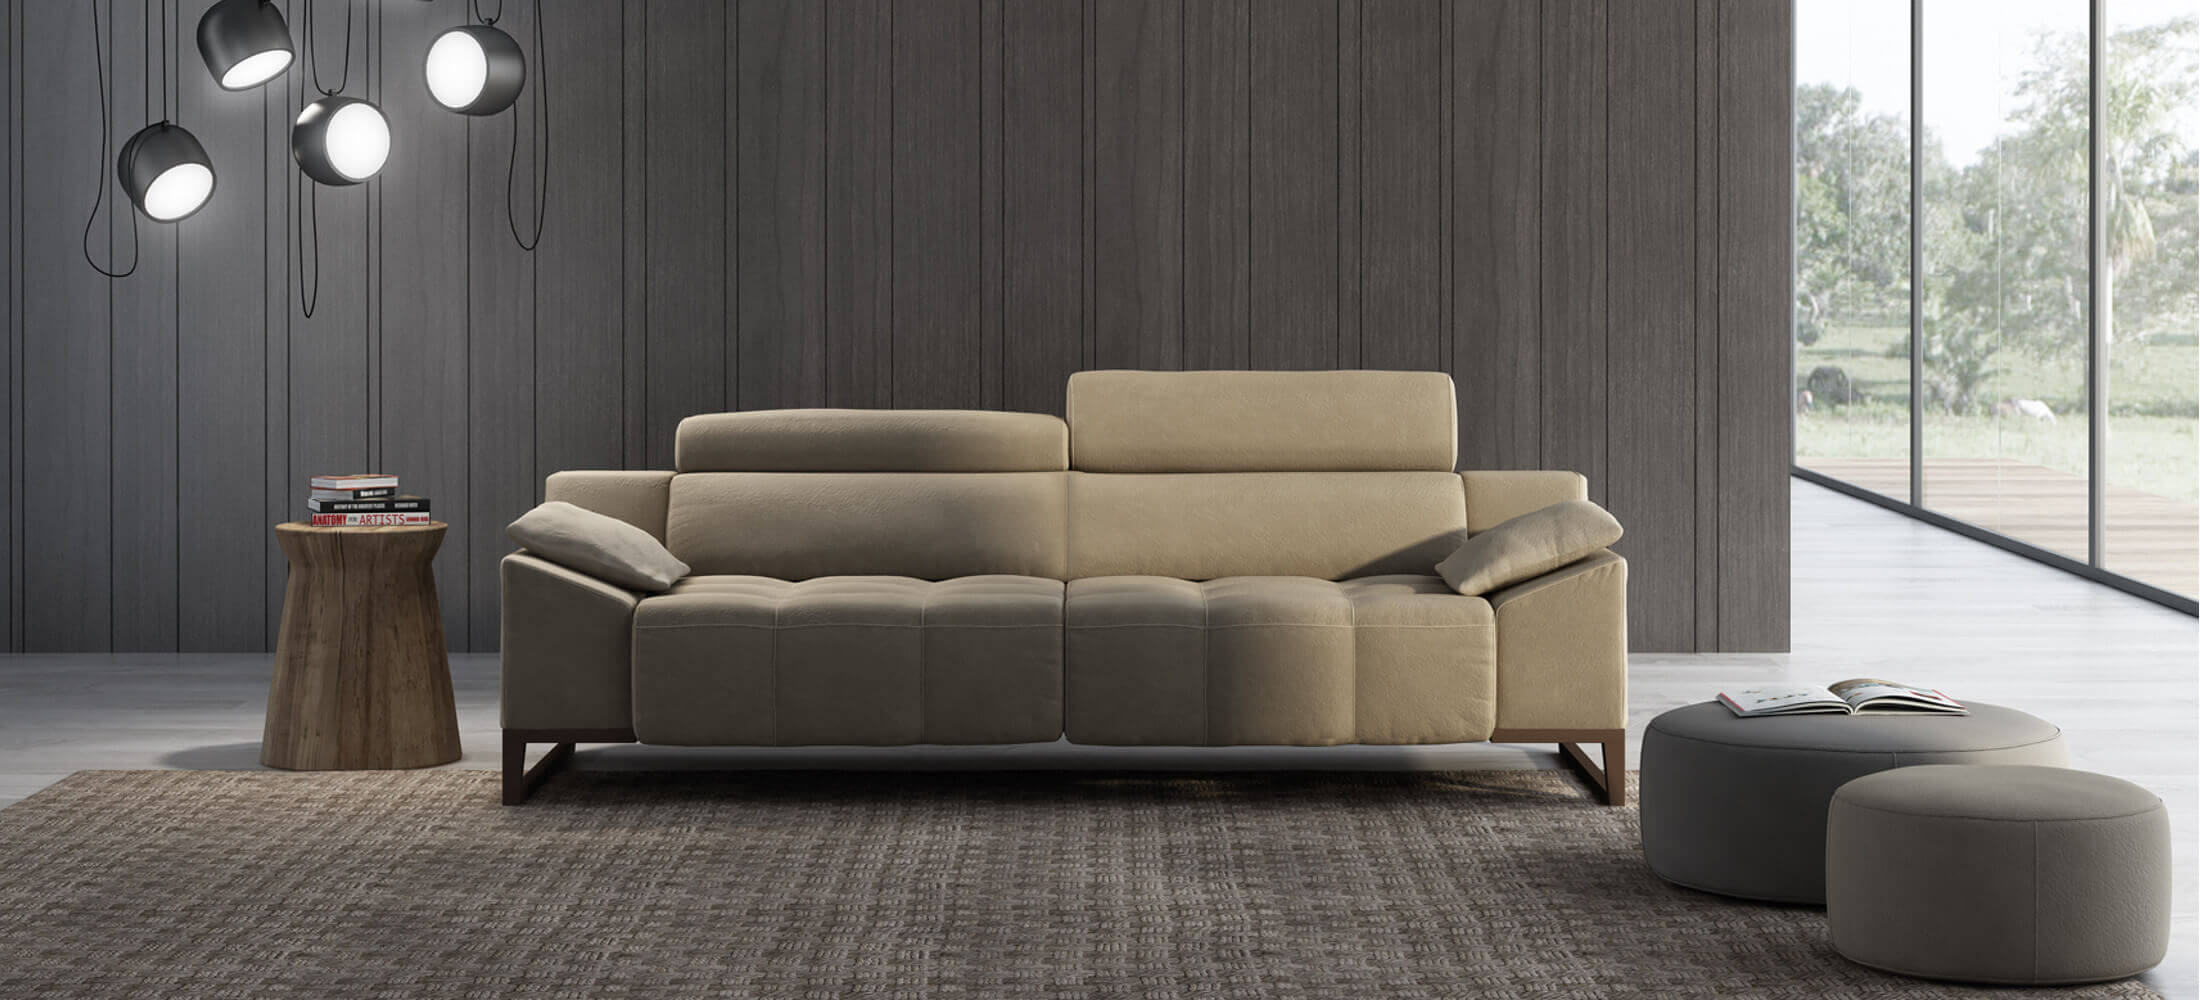 Ambiente Sofa Sham